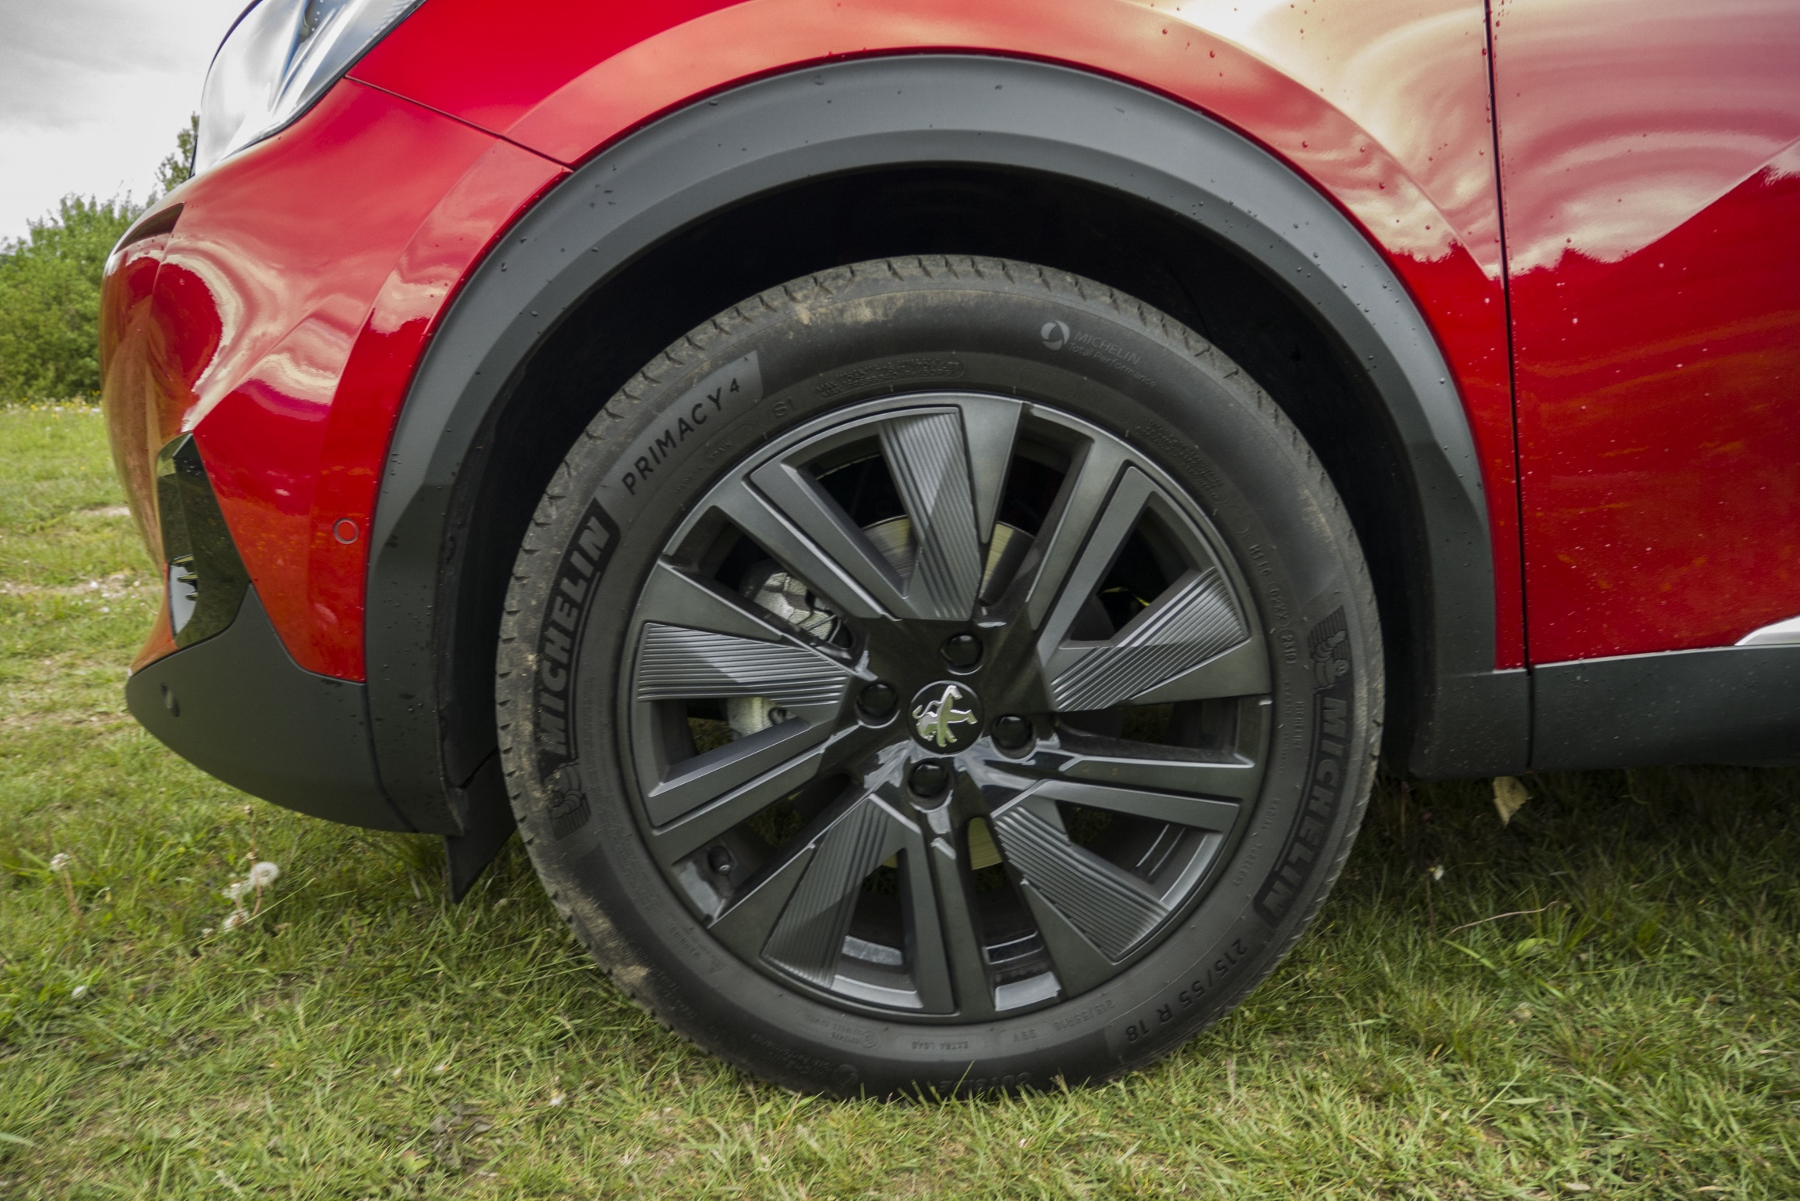 Test: Peugeot 2008 GT ohuruje silným trojvalcom a dobrou prevodovkou FlzmQqb0jt peugeot-2008-35